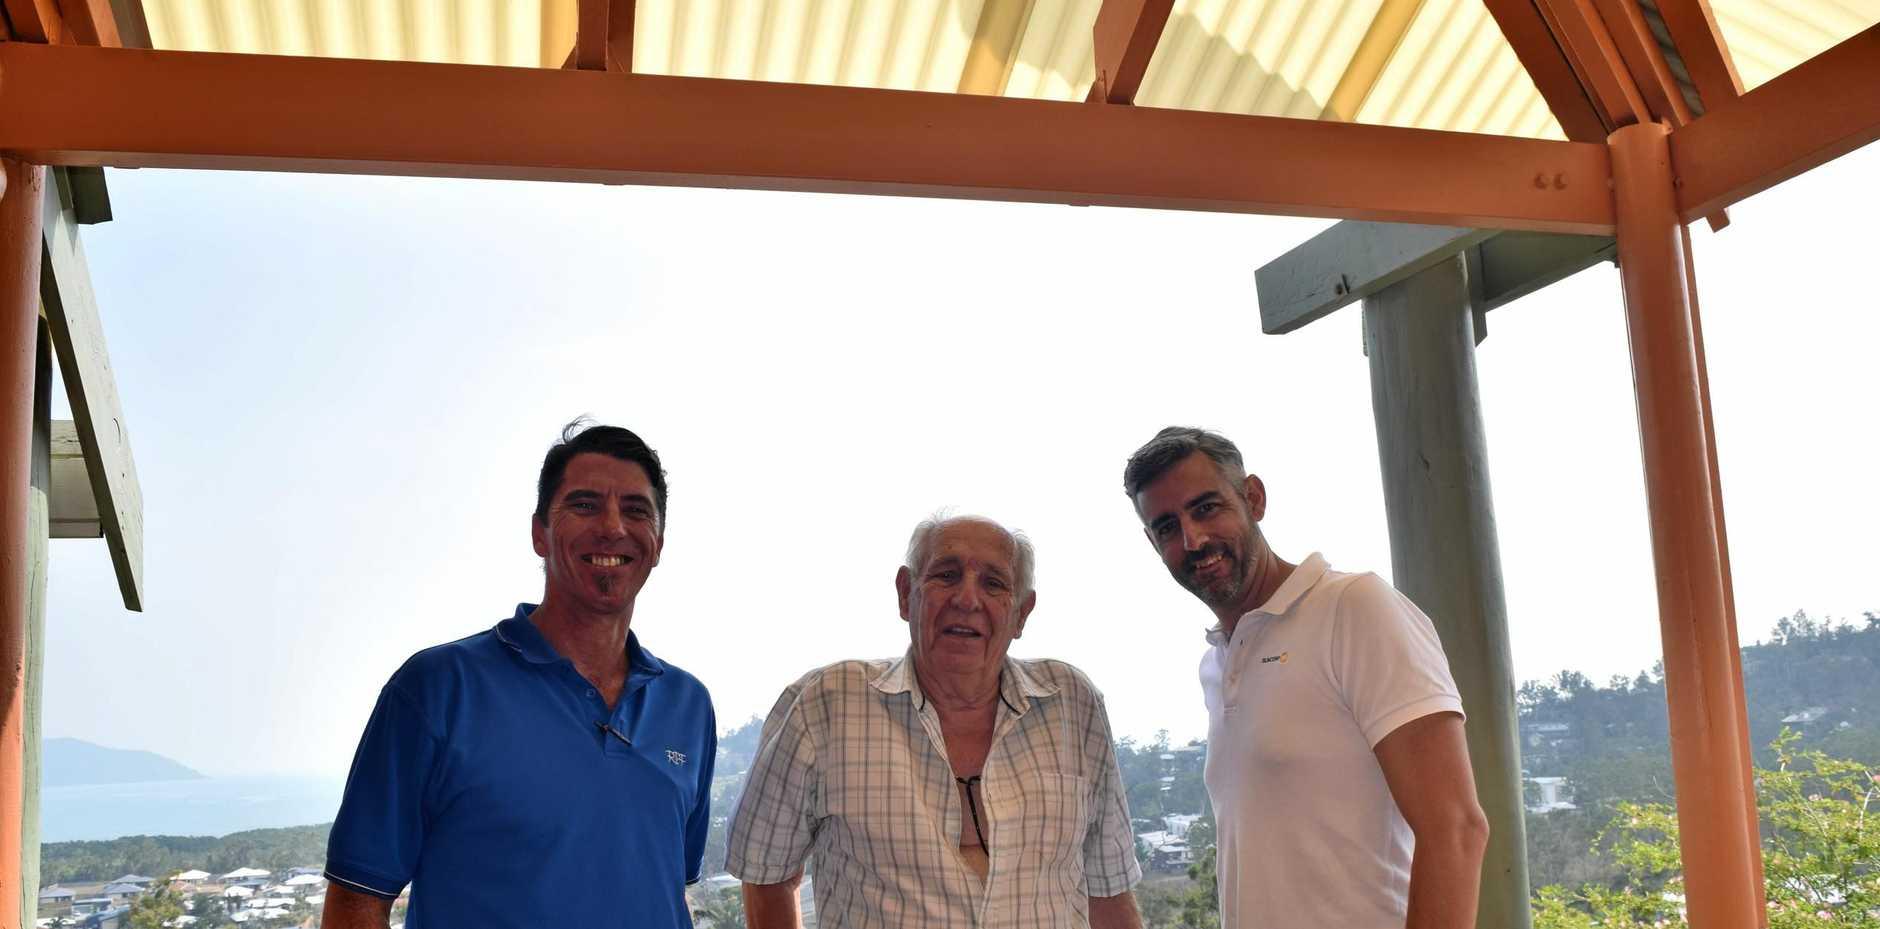 SATISFIED: RPF tradesman Cody Johnston, Gergorio Prevato and Josh Cooney underneath the fixed veranda roof.